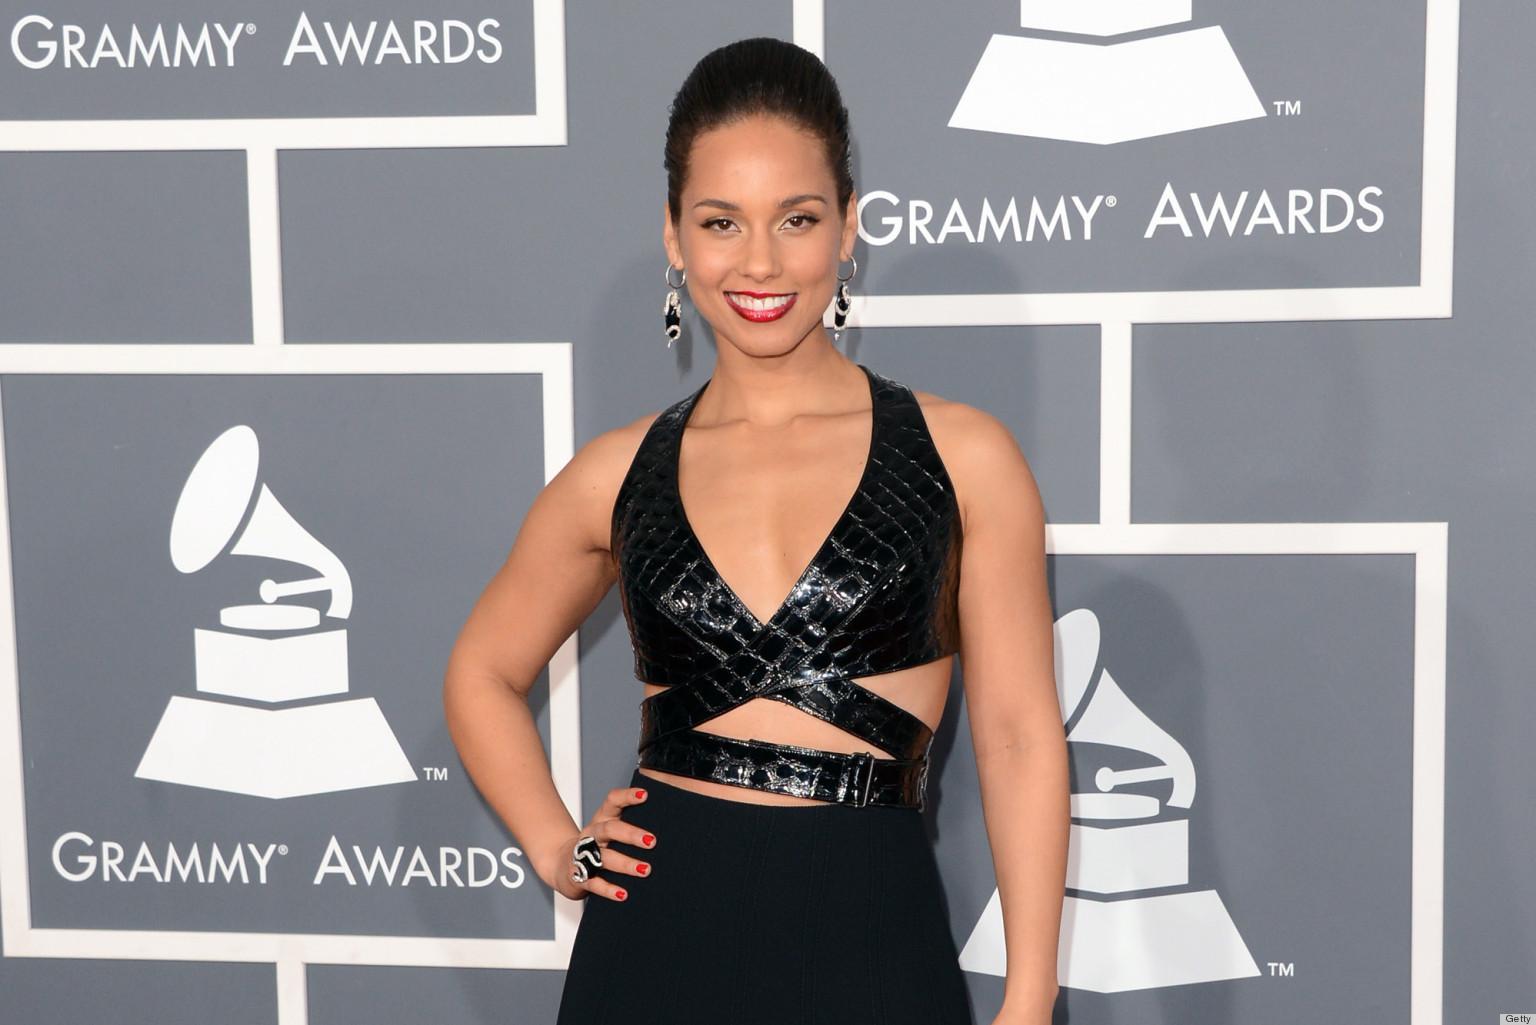 ALICIA-KEYS-GRAMMYS-DRESS-2013-facebook jpgAlicia Keys Grammy Dress